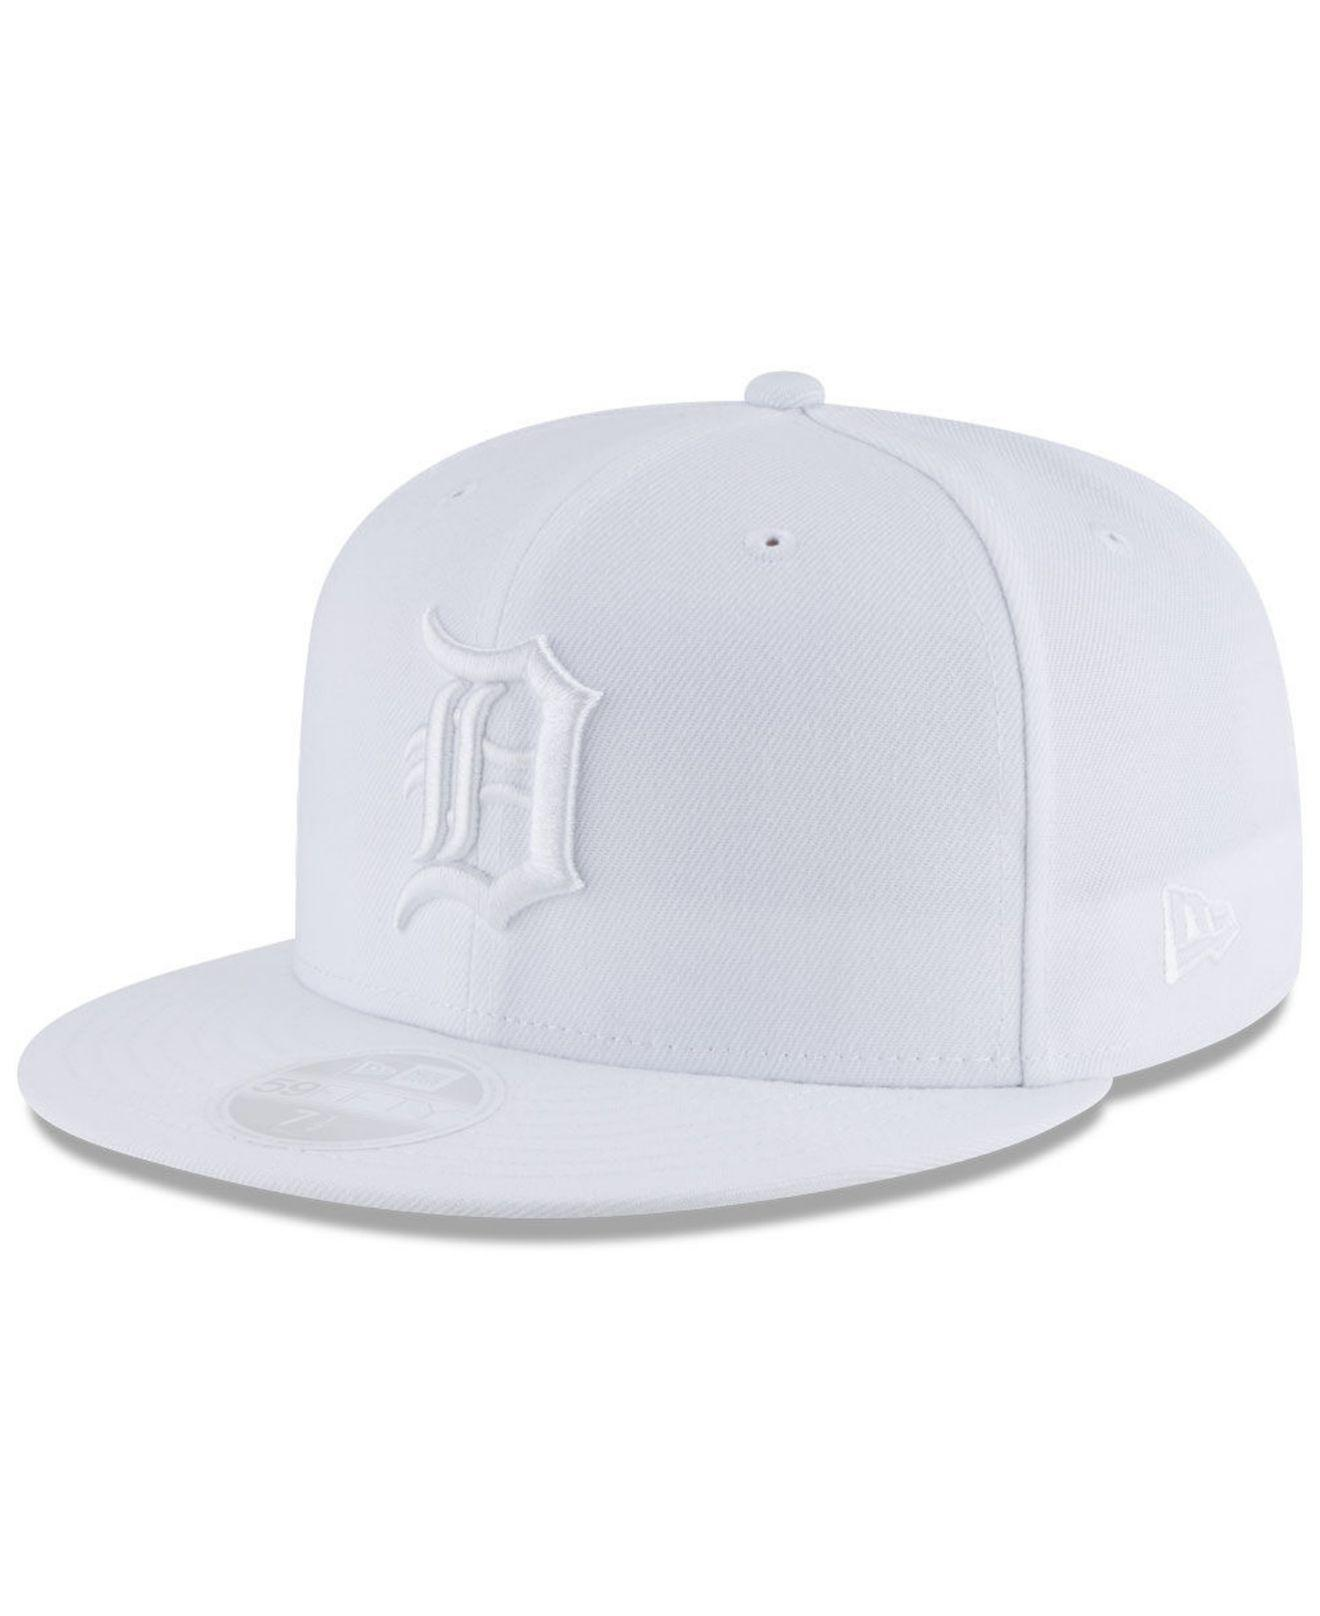 huge discount 89d61 d1f3d KTZ. Men s Detroit Tigers White Out 59fifty Fitted Cap